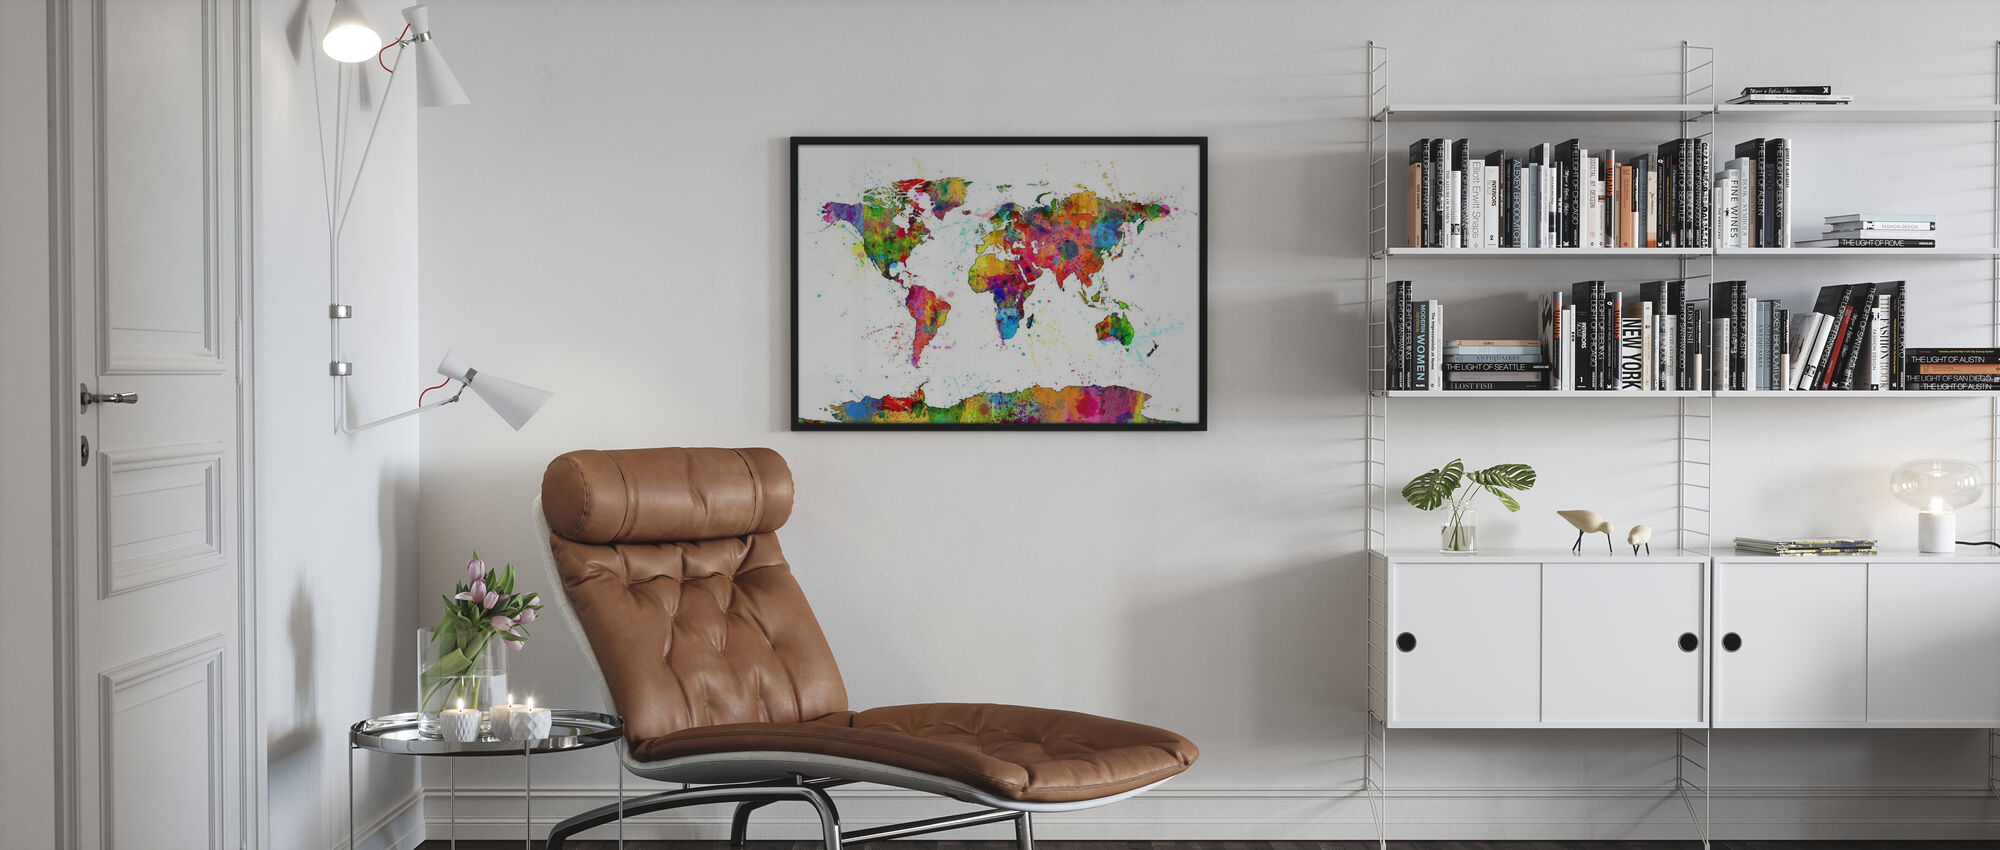 Paint Splashes Map 2 - Poster - Living Room